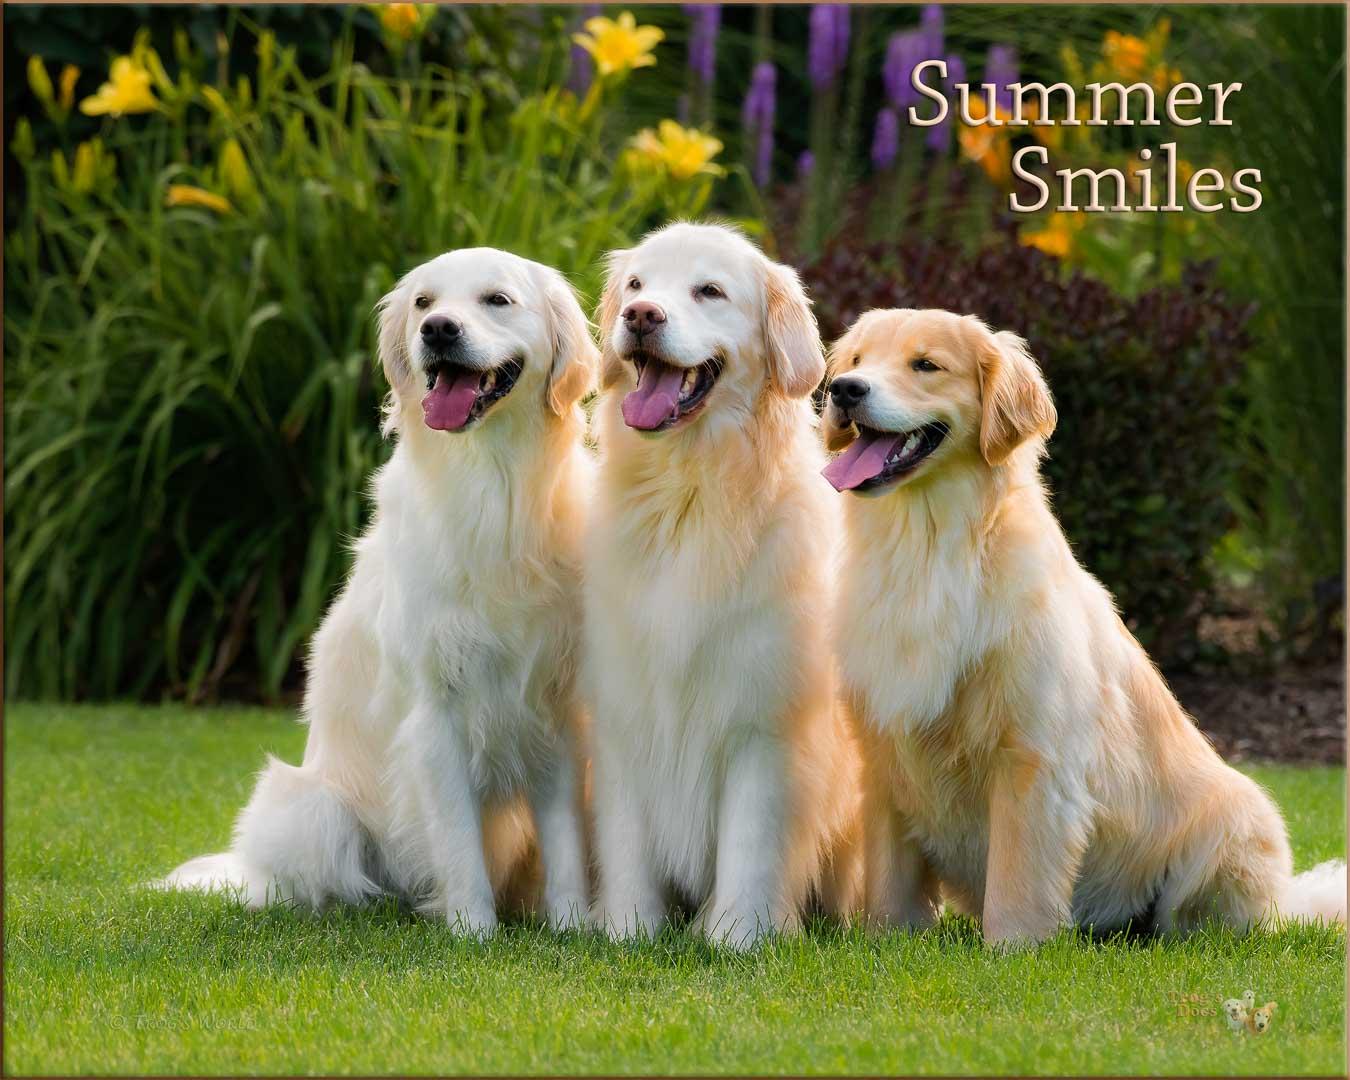 The Golden Retrievers on a summer day